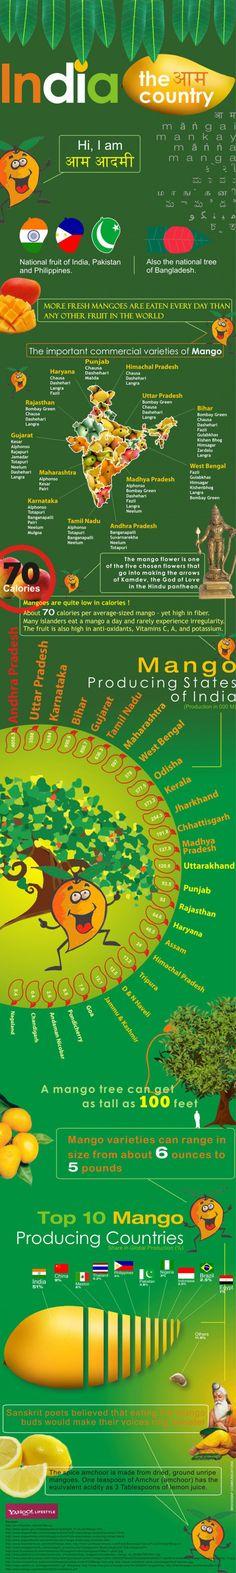 Mango map of India Infographic